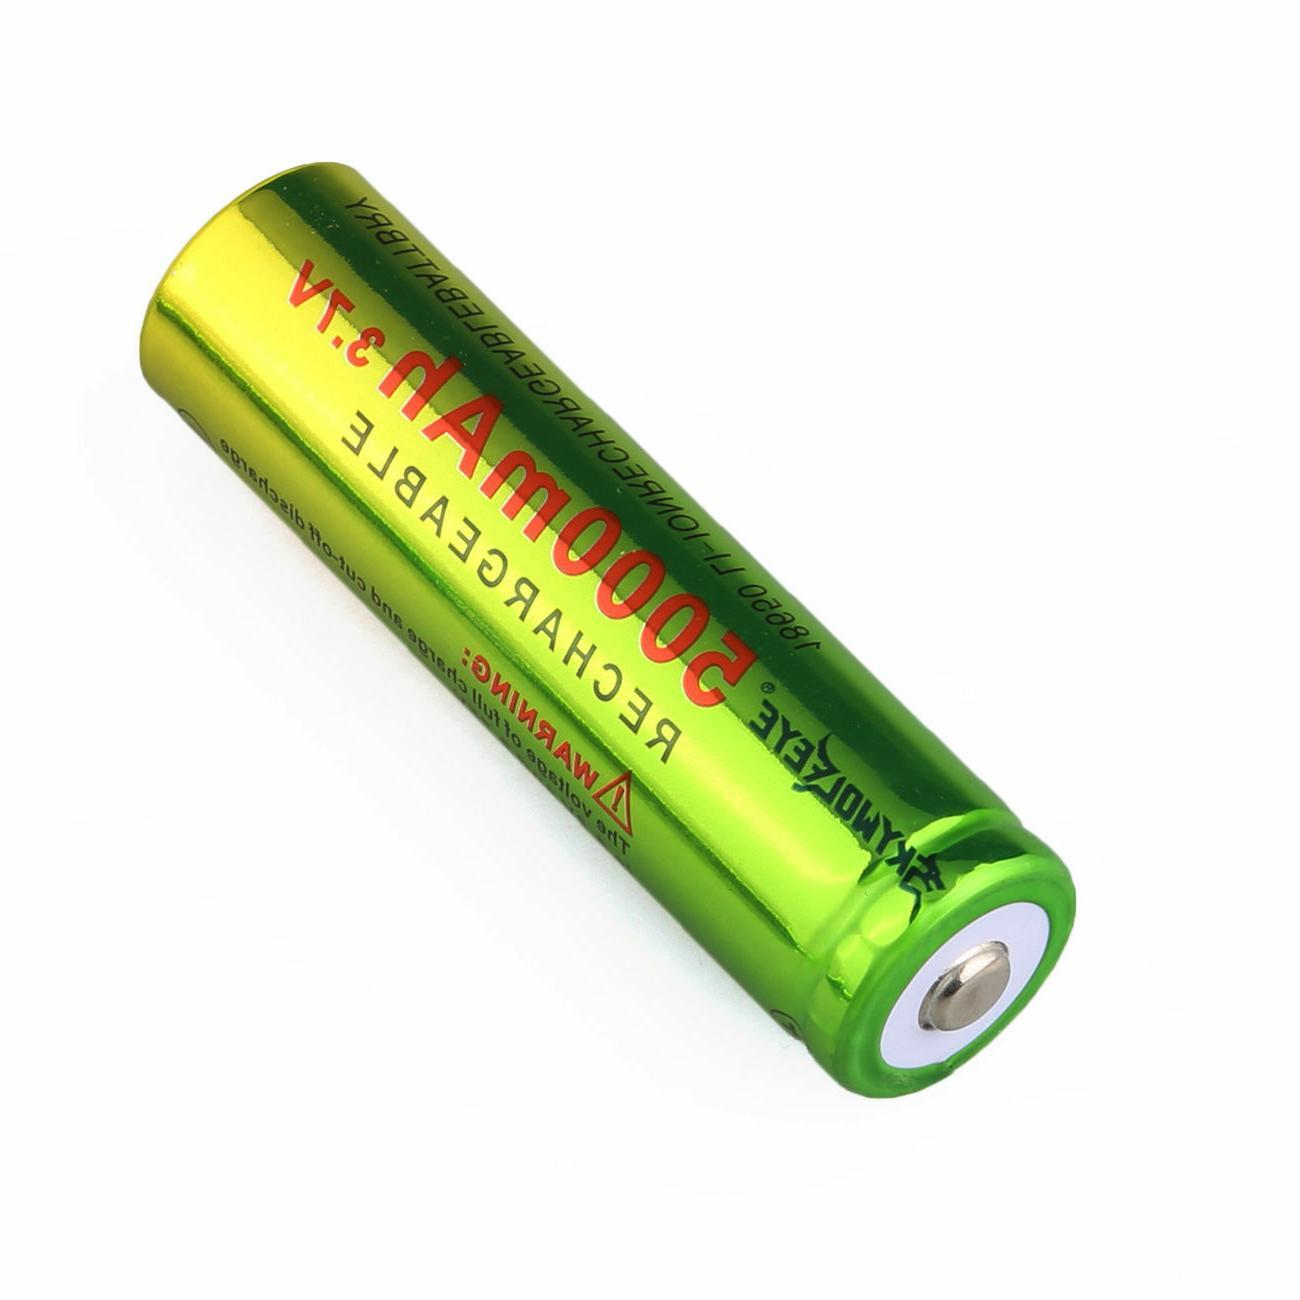 3.7V Li-ion Rechargeable Batteries